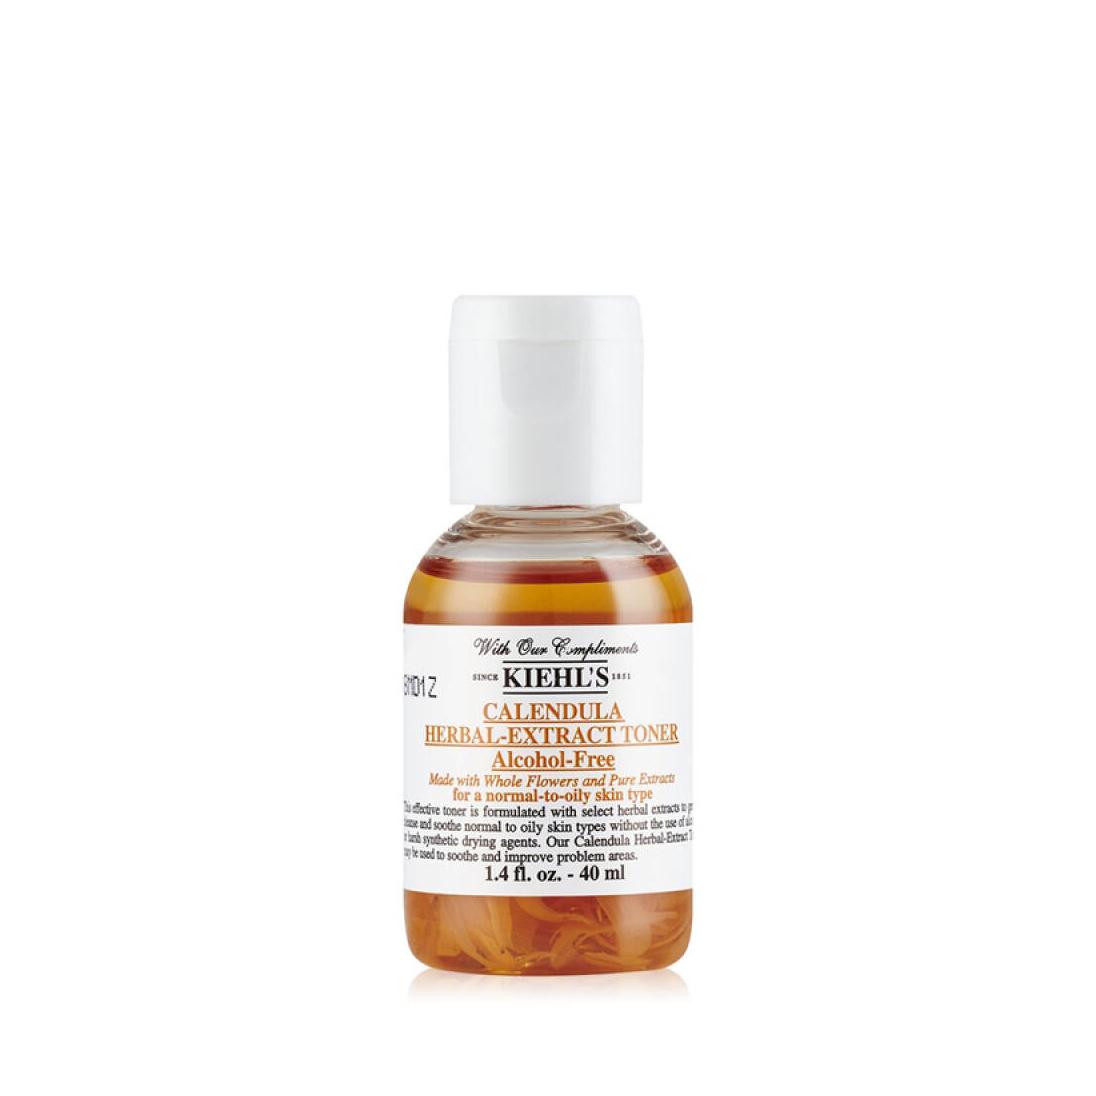 KIEHL'S Calendula Herbal Extract Toner Alcohol-Free (ขนาดทดลอง)